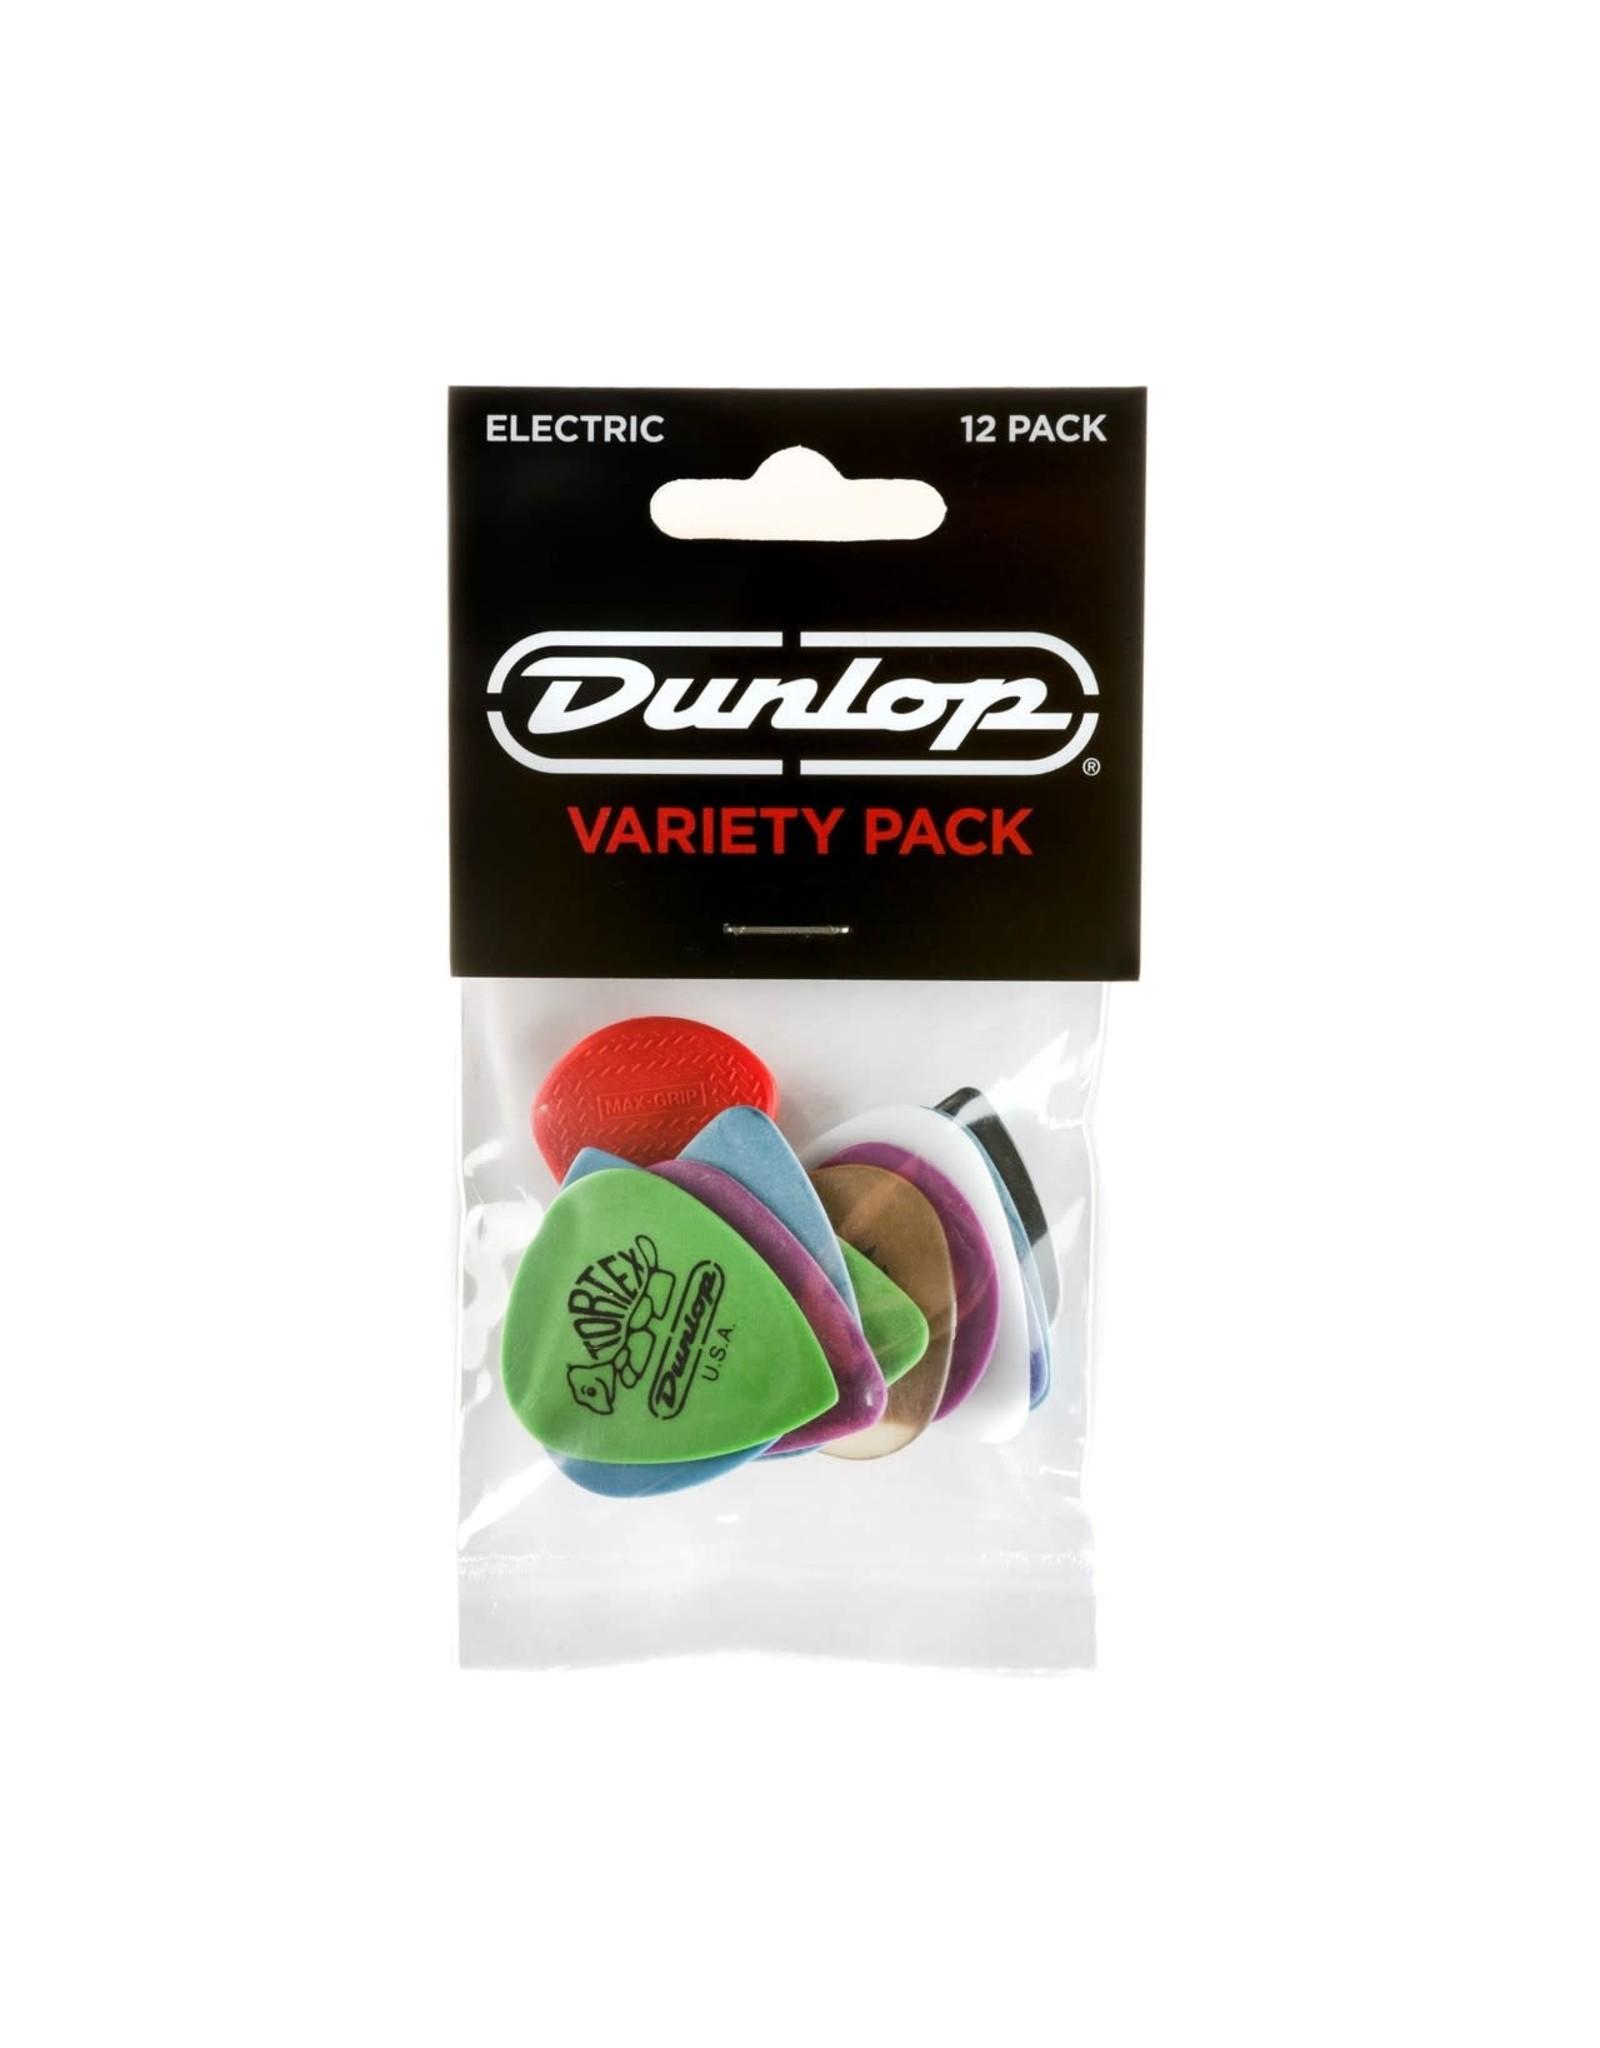 Dunlop Dunlop ELECTRIC PICK VARIETY PACK